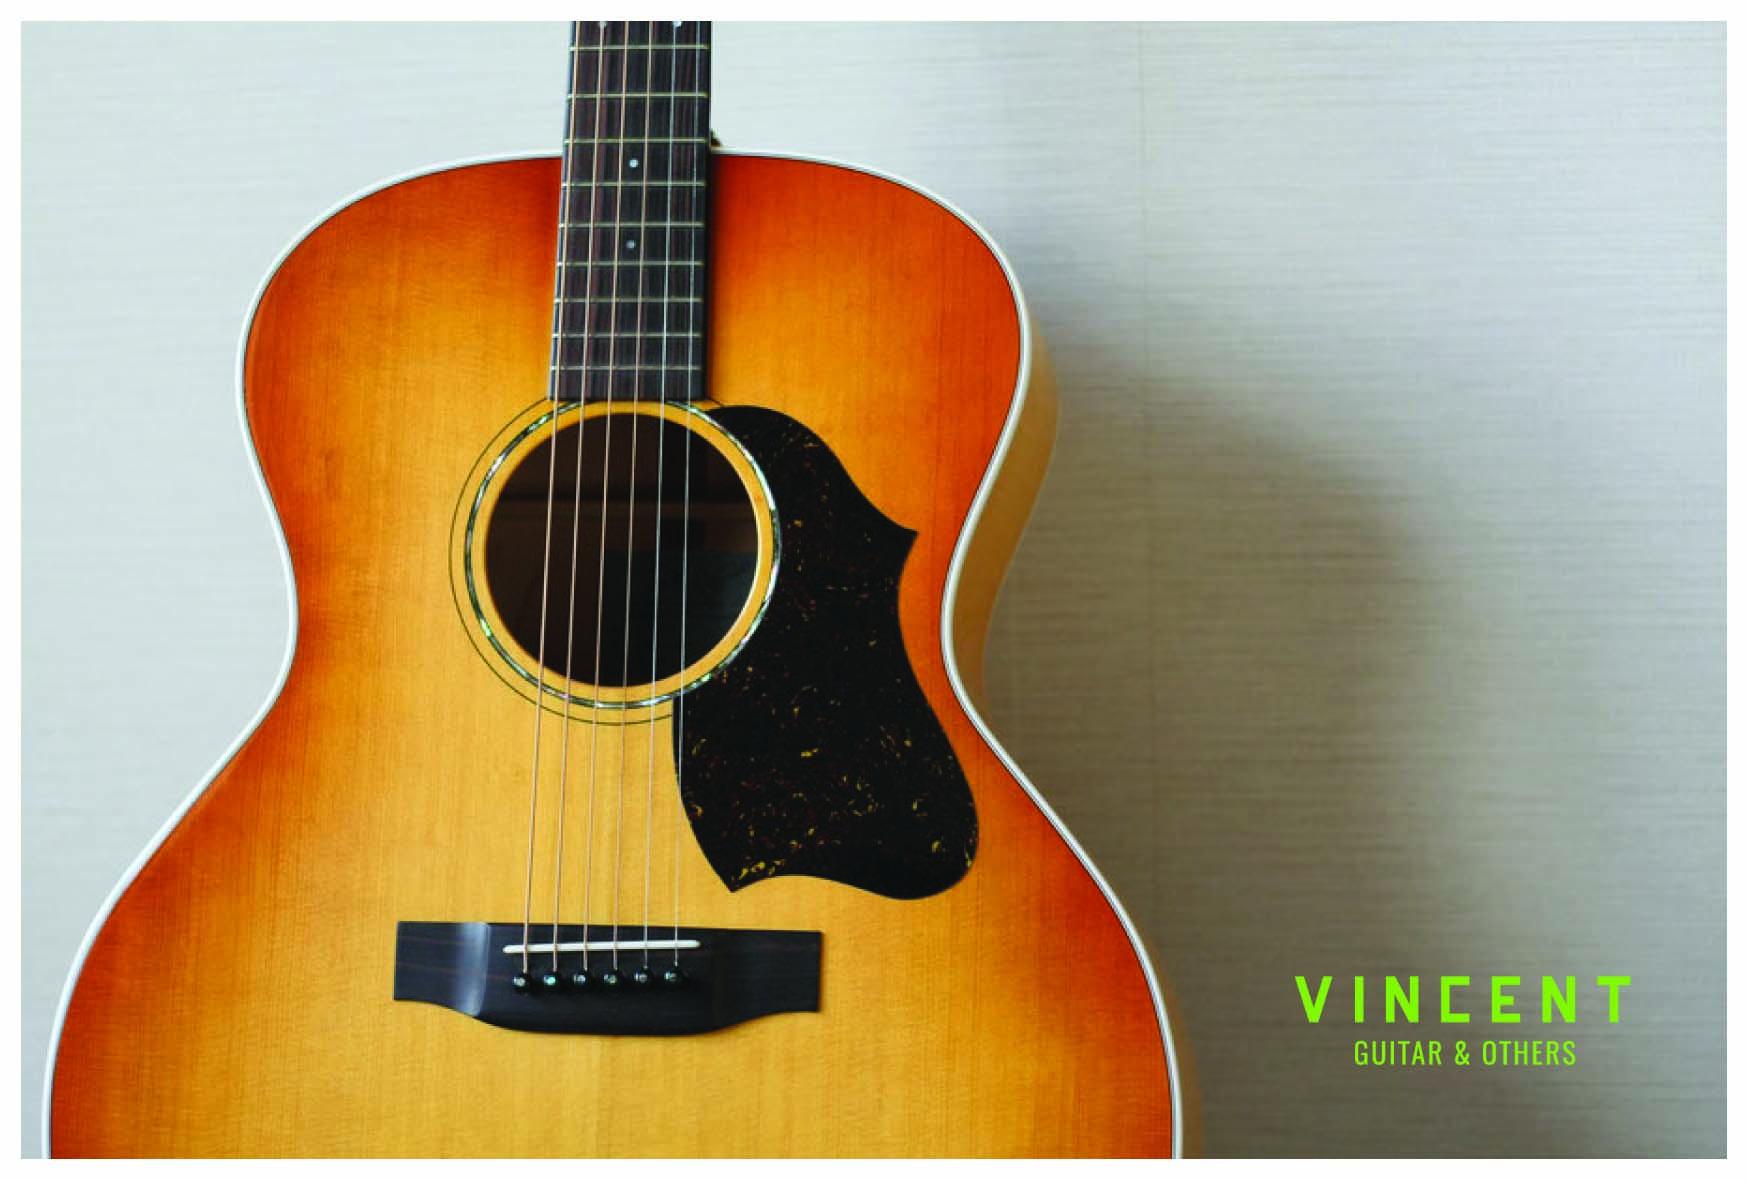 VINCENT guitar&others